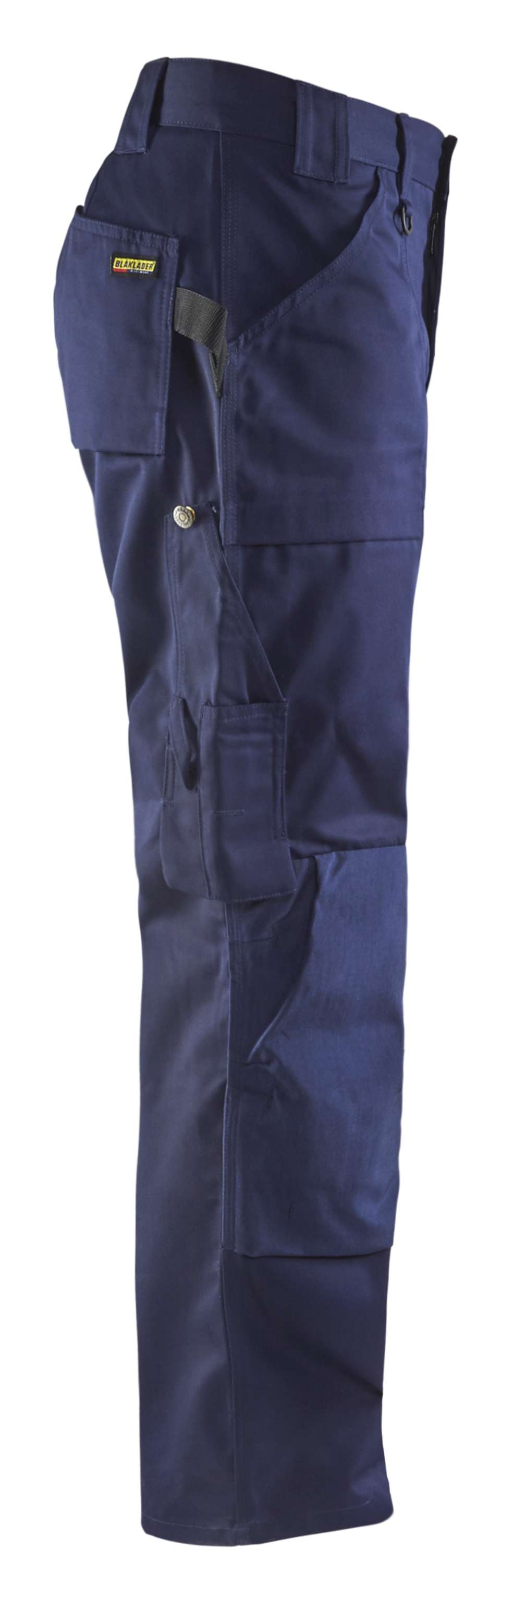 Blaklader Broeken 15701860 marineblauw(8900)